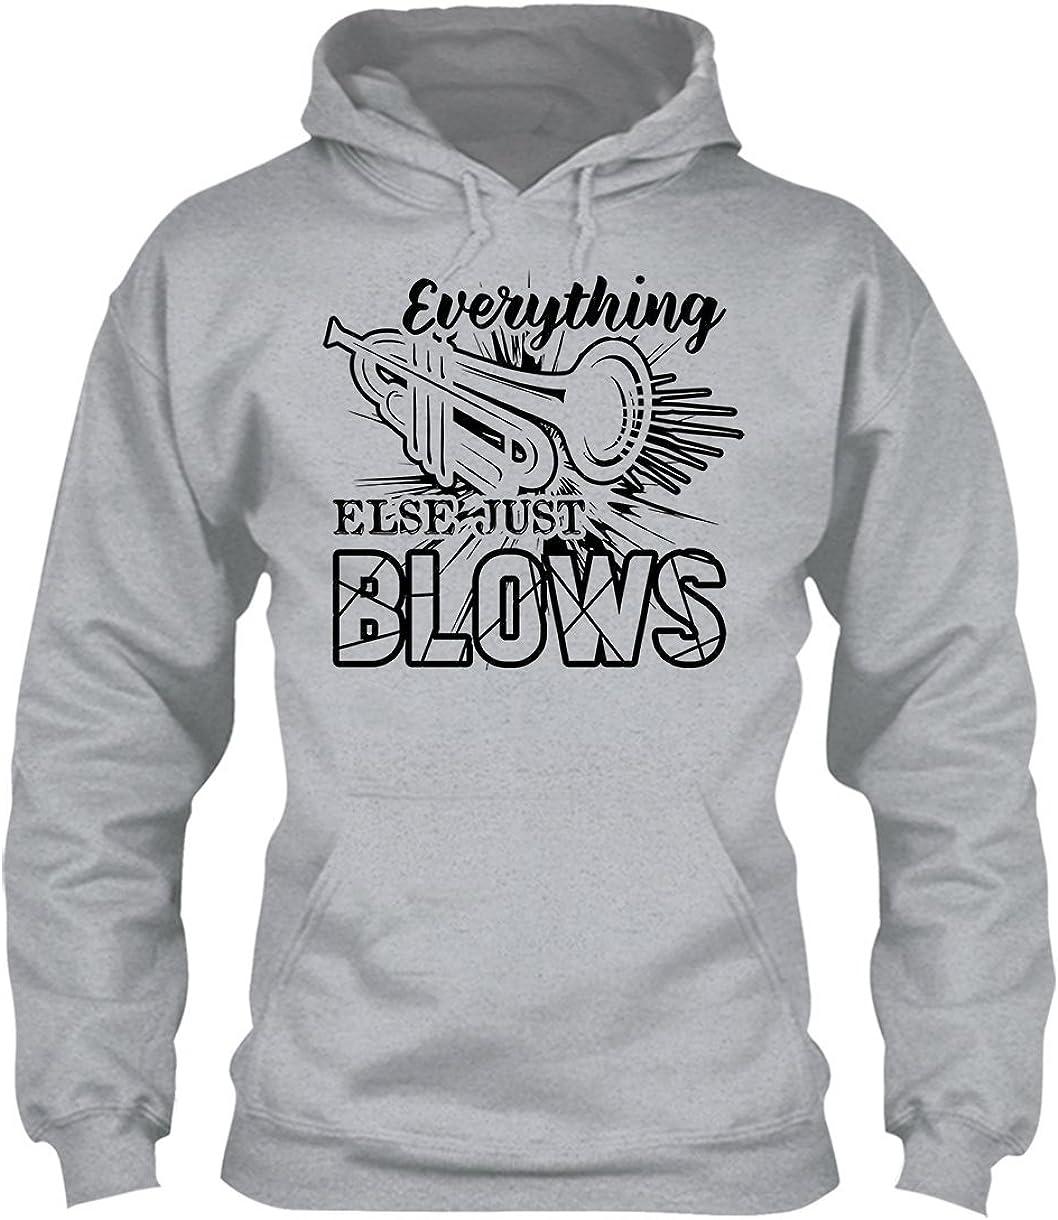 Tee Shirt Clothing Big Grey Blows Trumpet Shirt